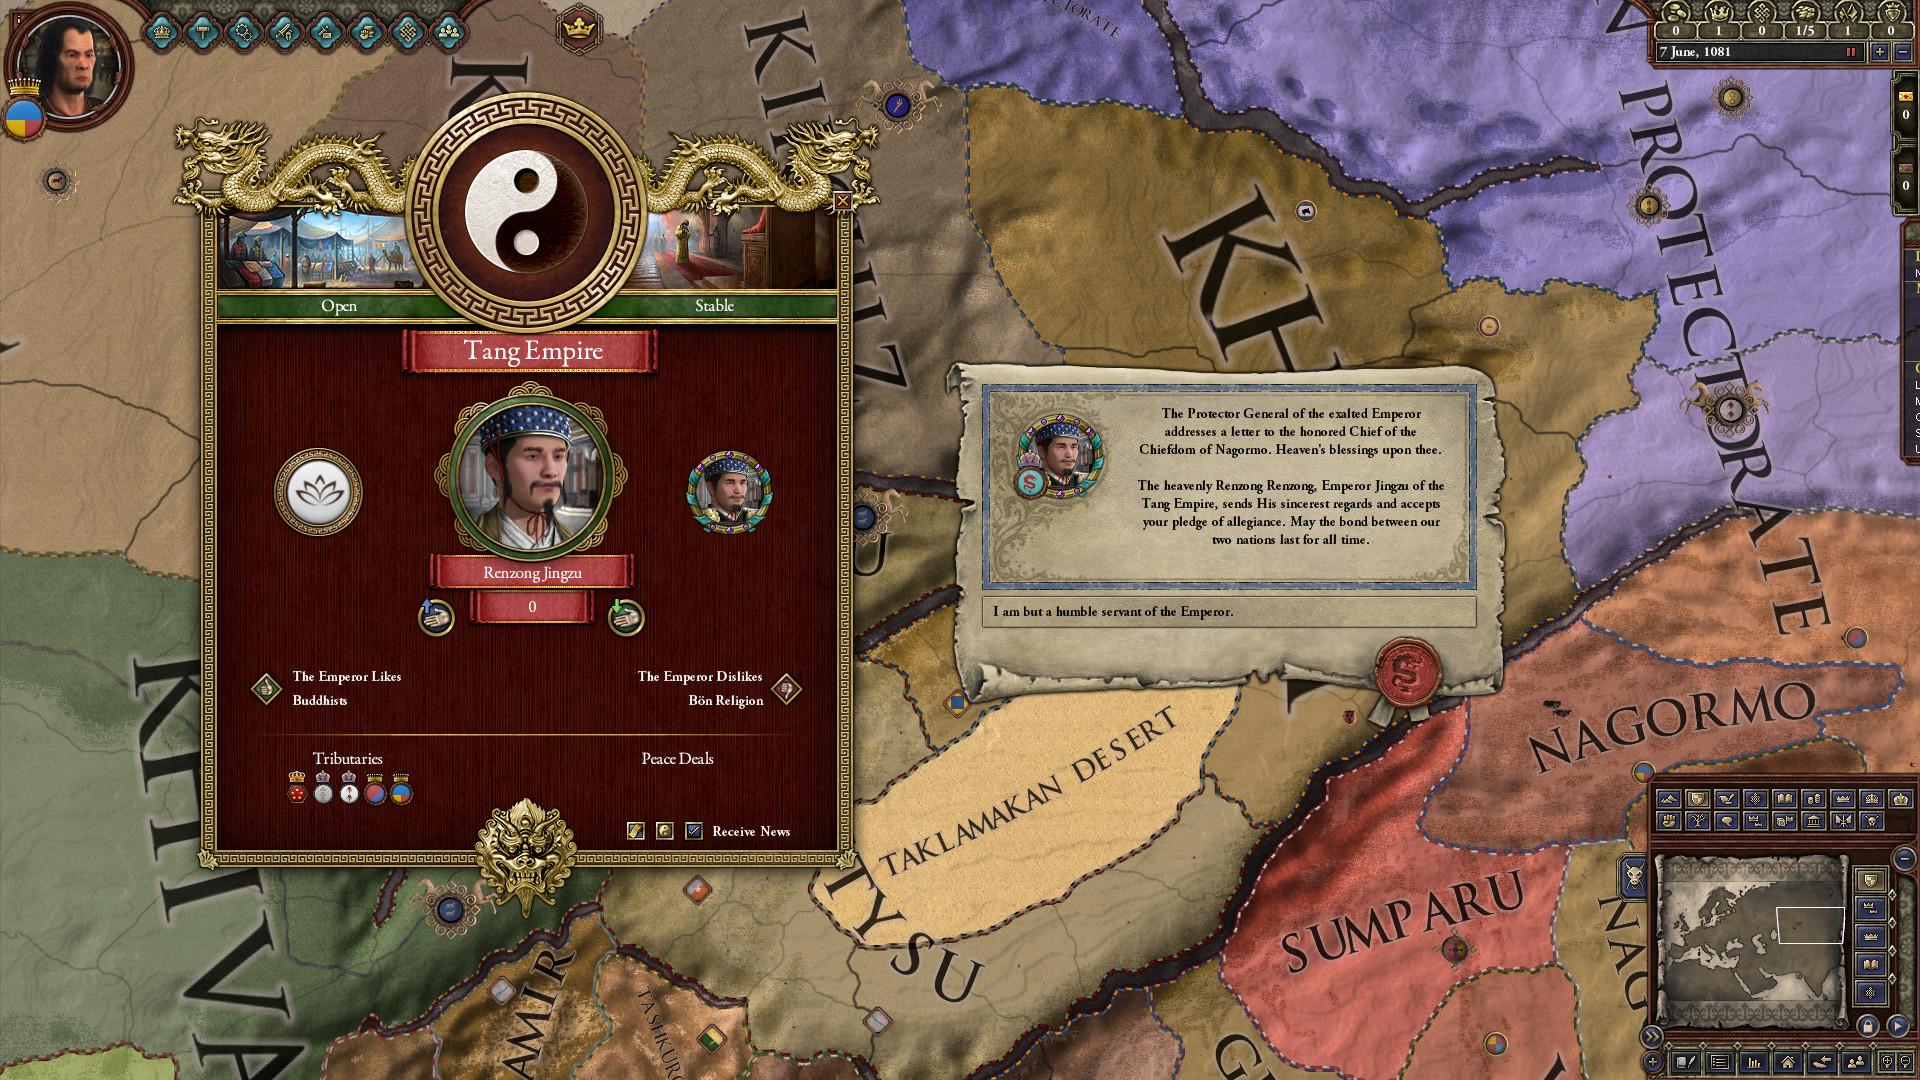 Expansion - Crusader Kings II: Jade Dragon on Steam